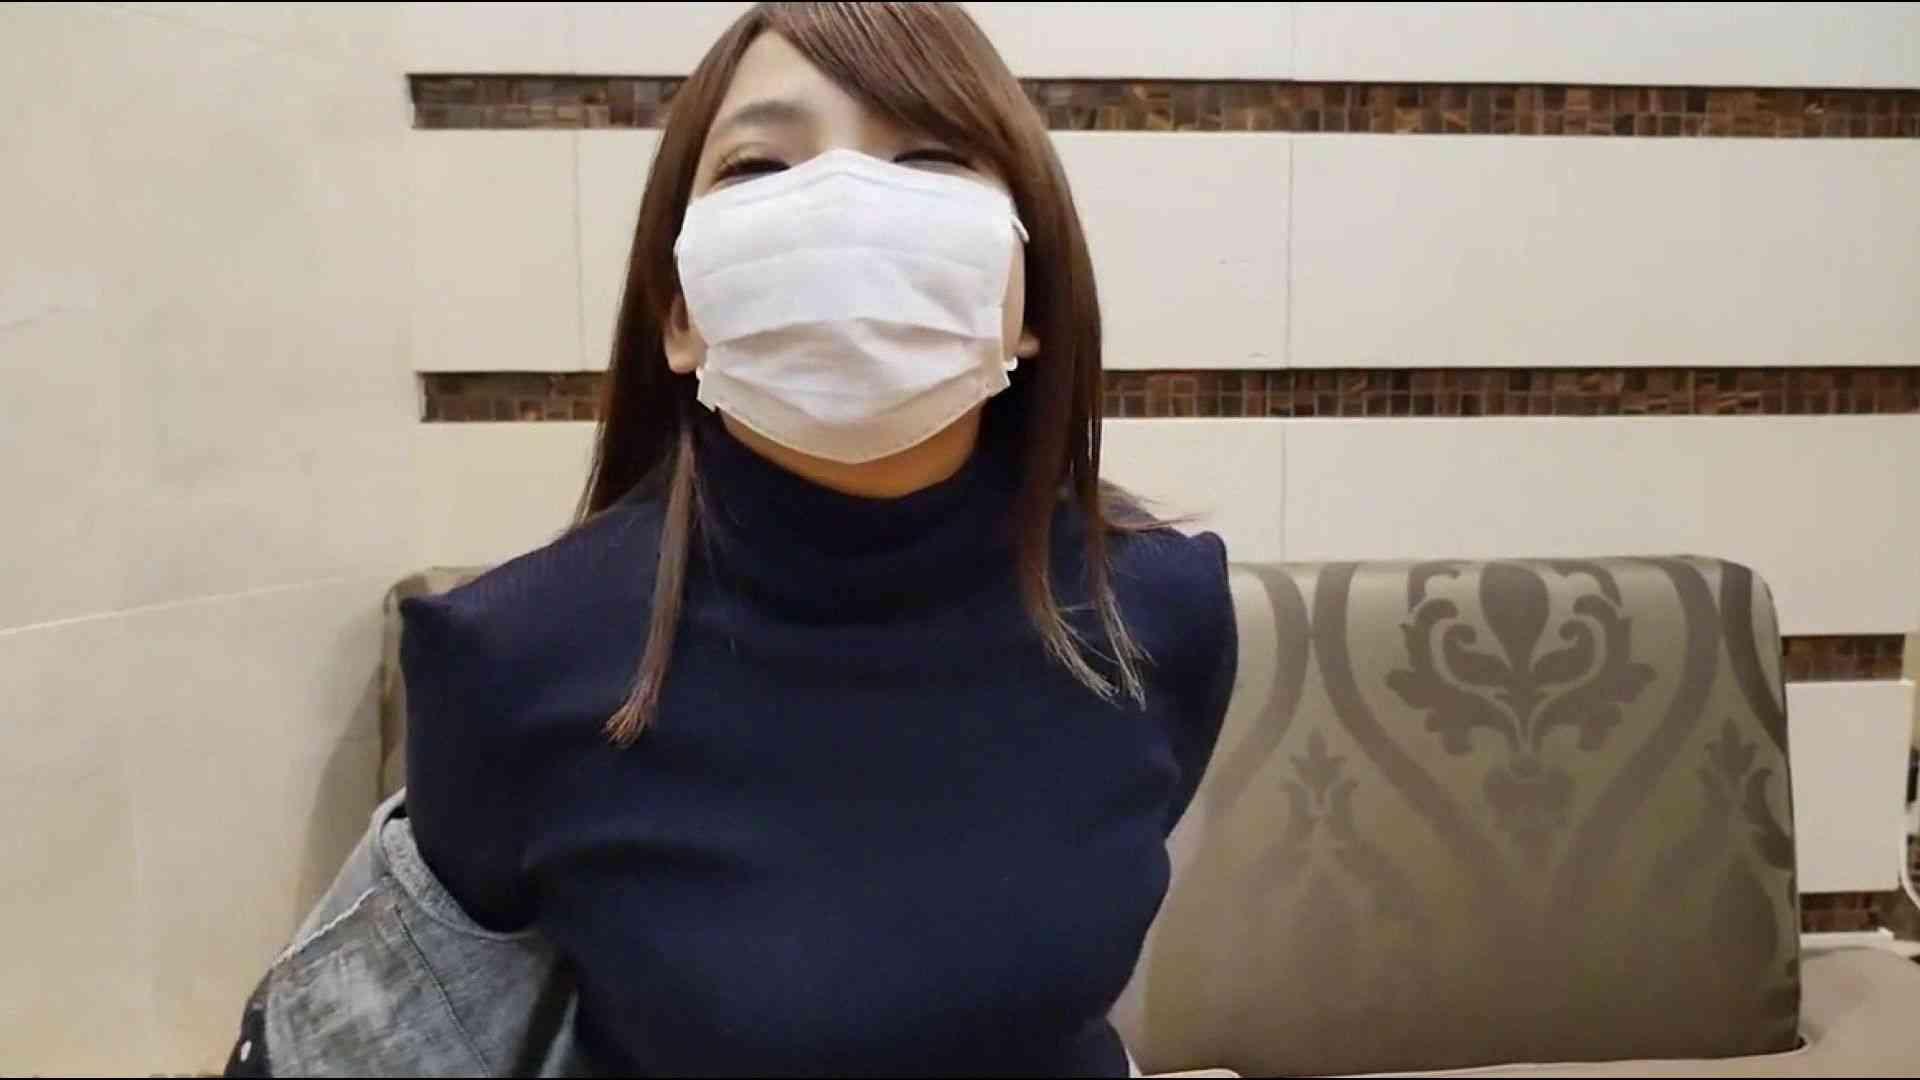 S級厳選美女ビッチガールVol.41 前編 OL女体   美女  105連発 33